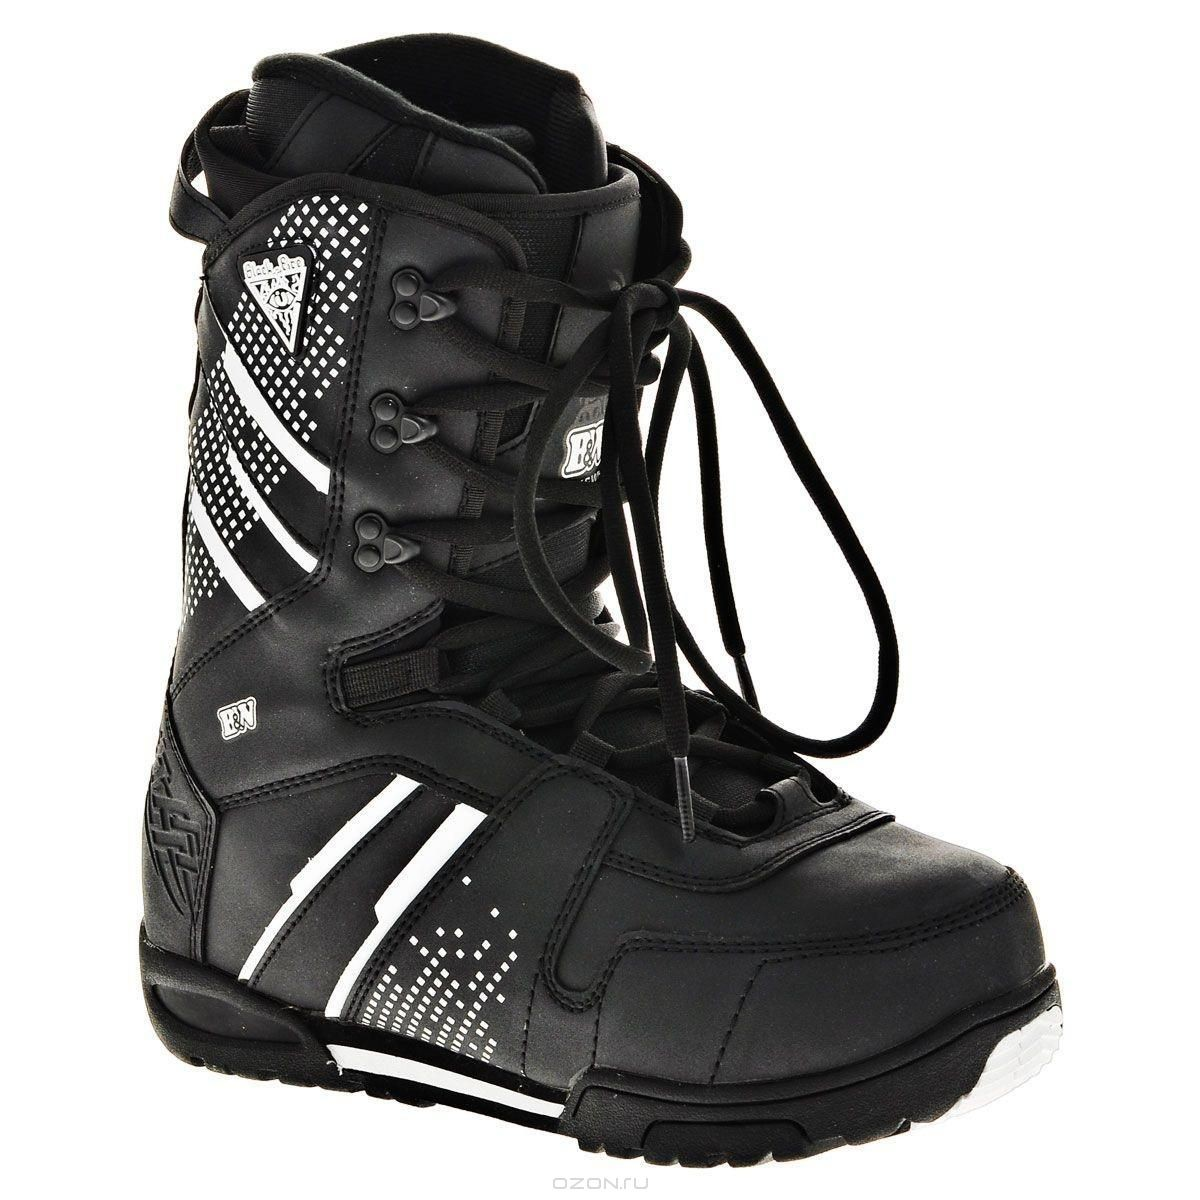 Ботинки для сноуборда Black Fire B&W, размер: 41